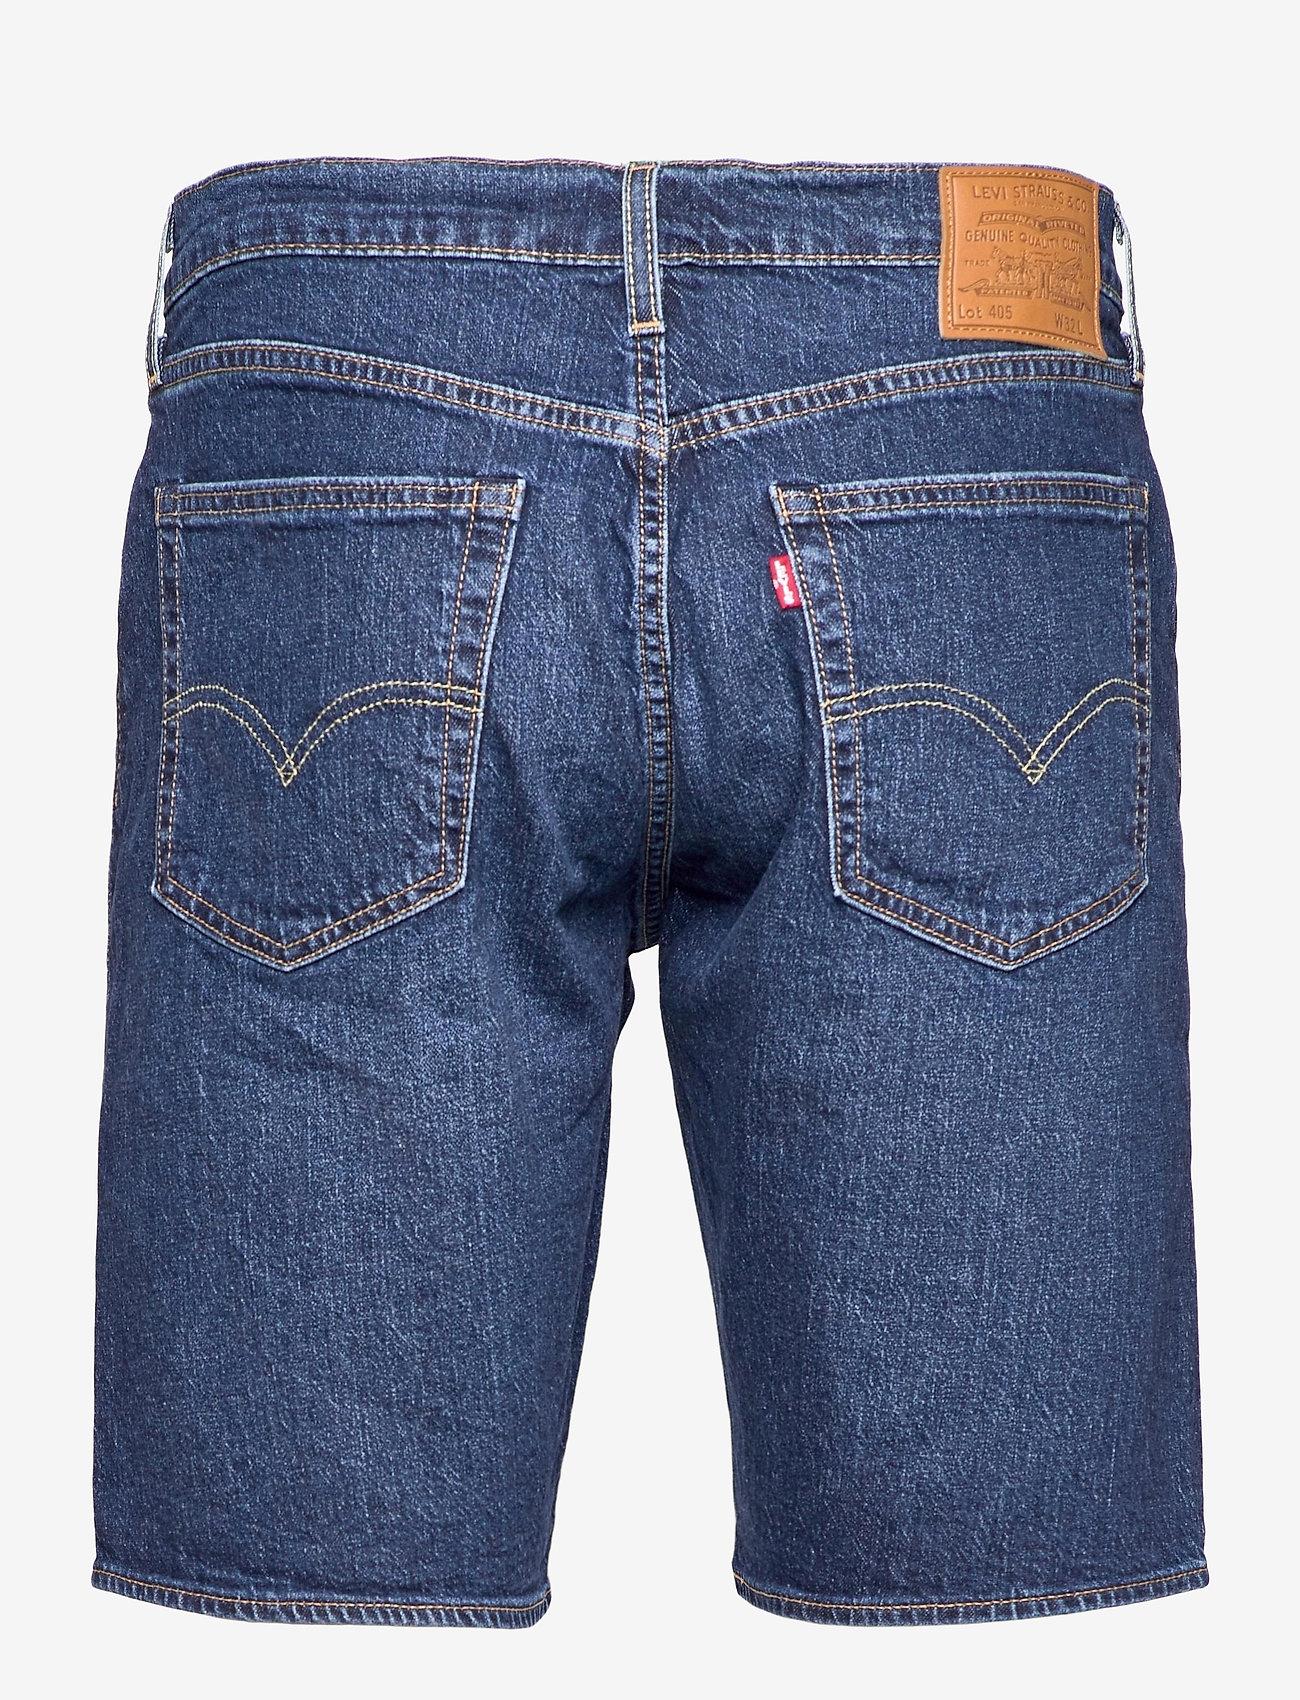 LEVI´S Men - 405 STANDARD SHORT DANCE FLOOR - jeansowe szorty - med indigo - flat finish - 1